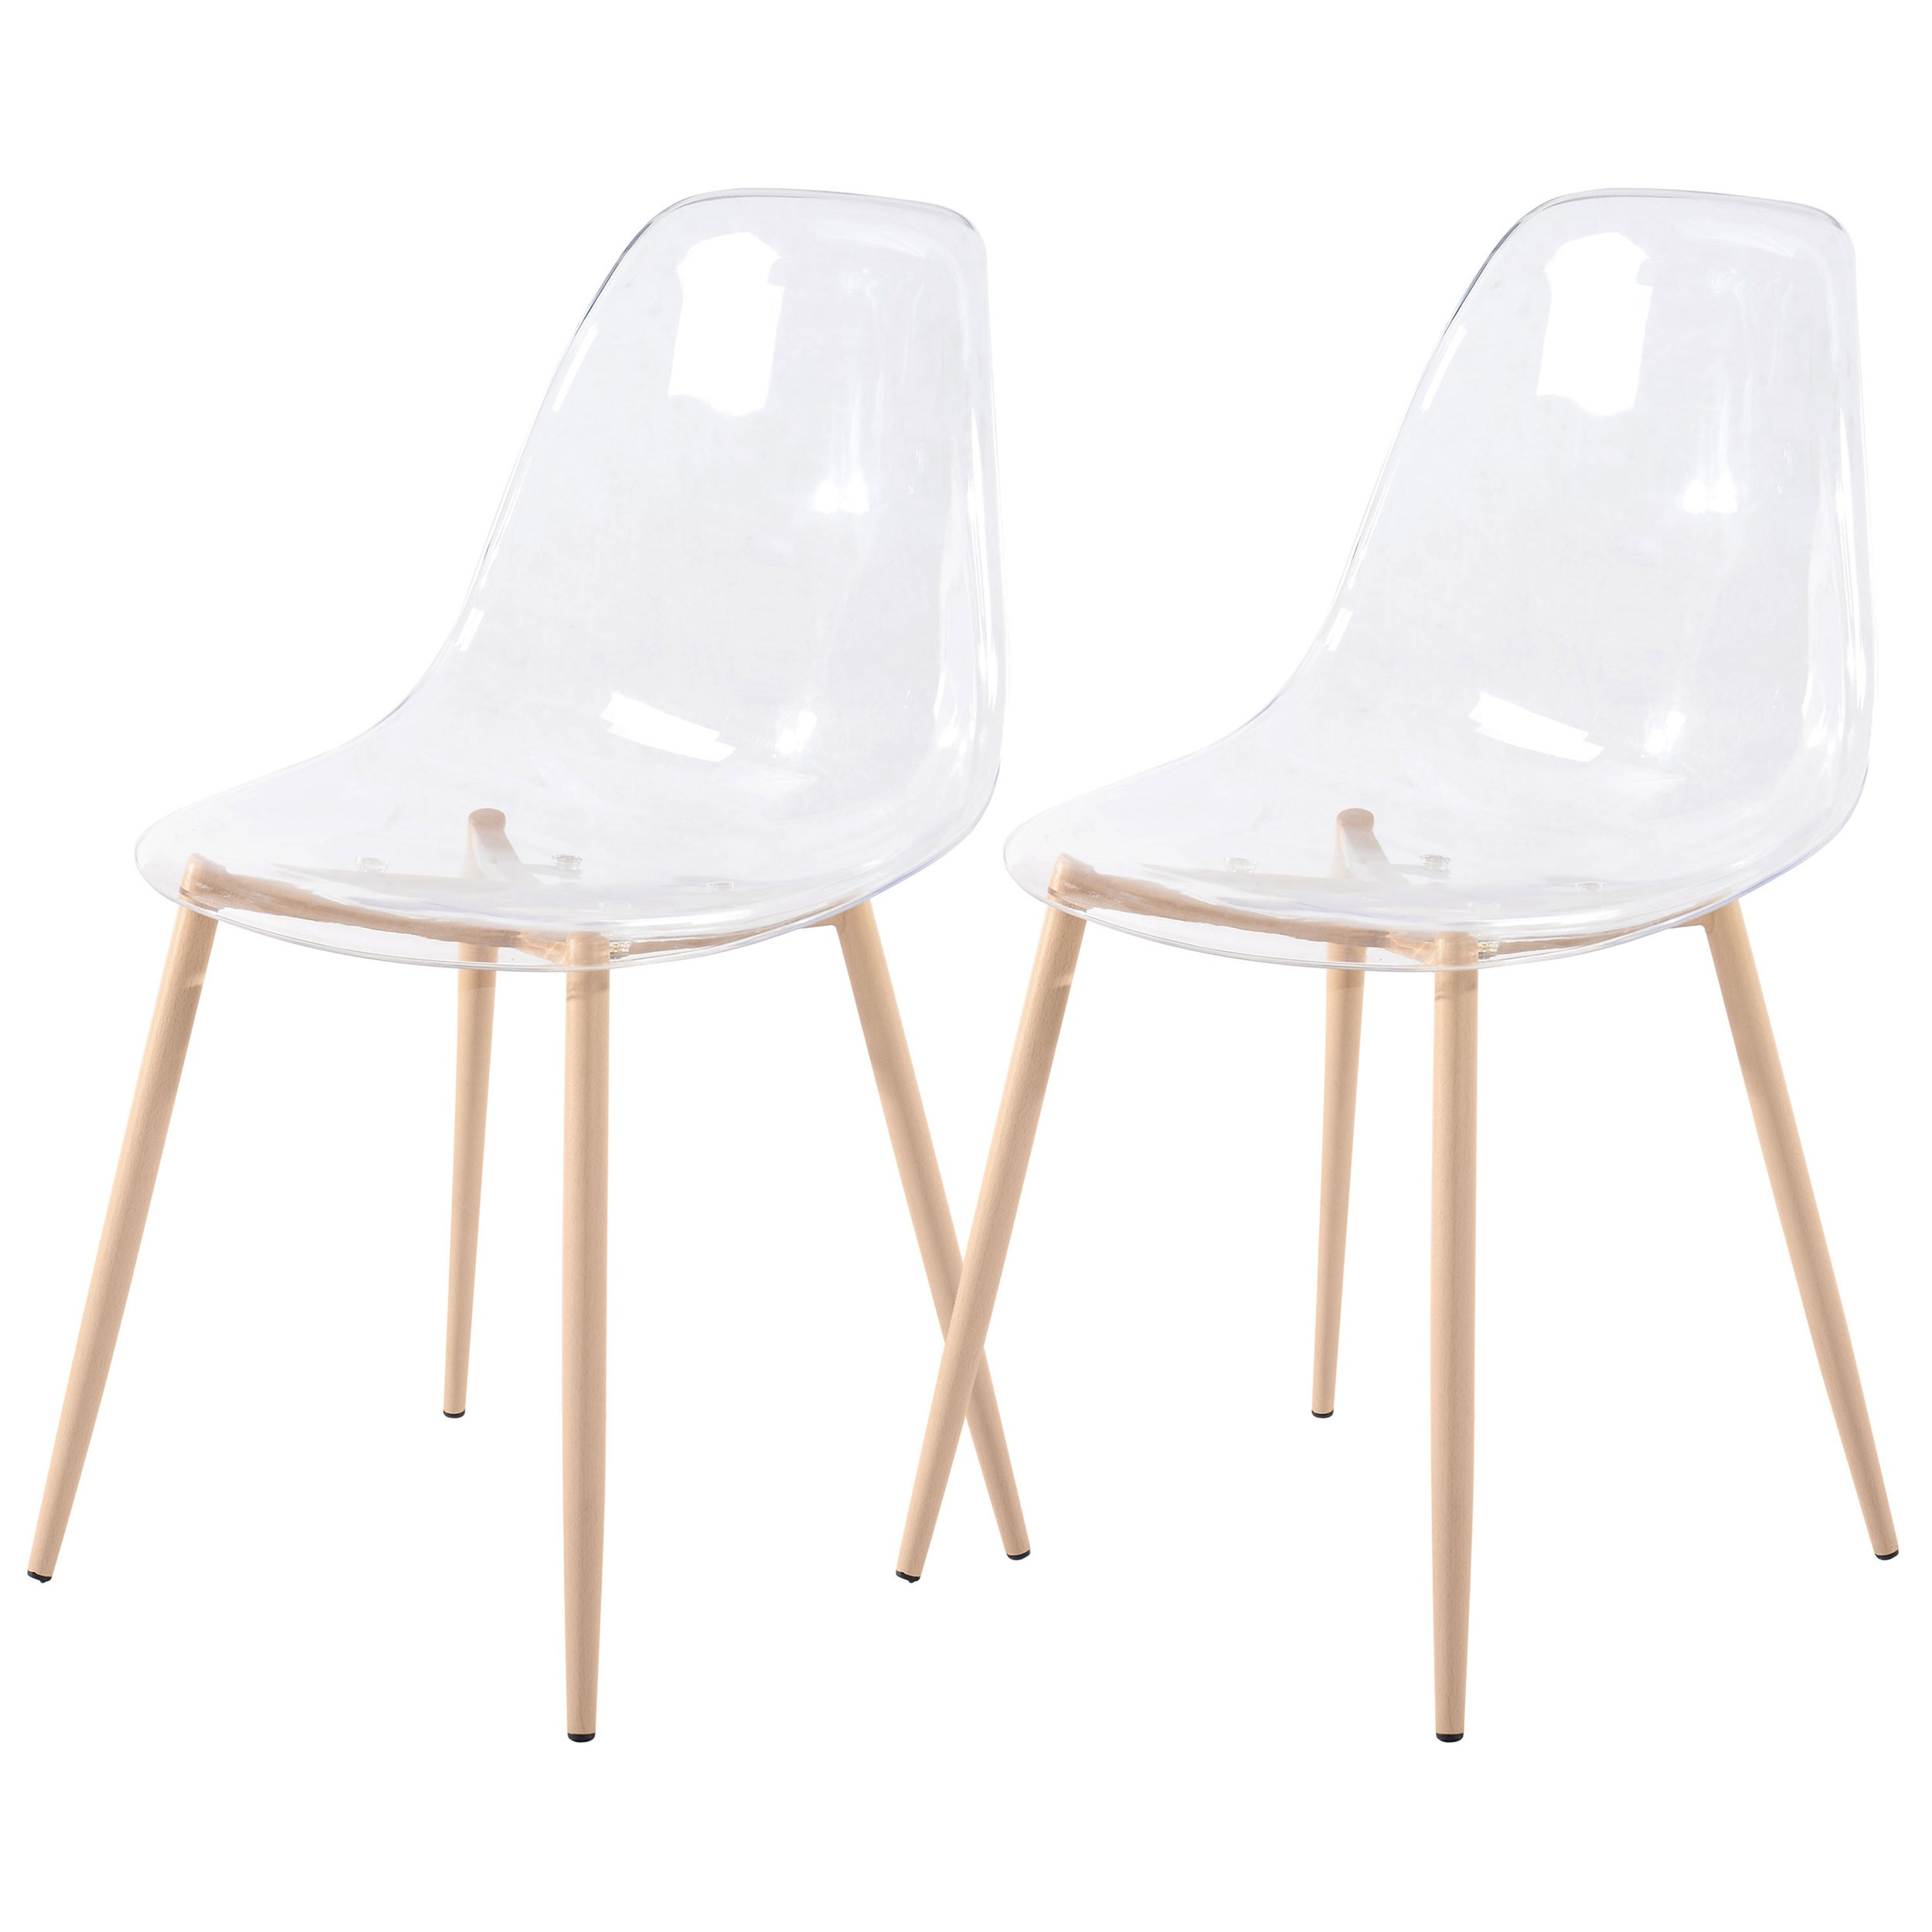 acheter chaise transparente scandinave - Chaise Scandinave Transparente